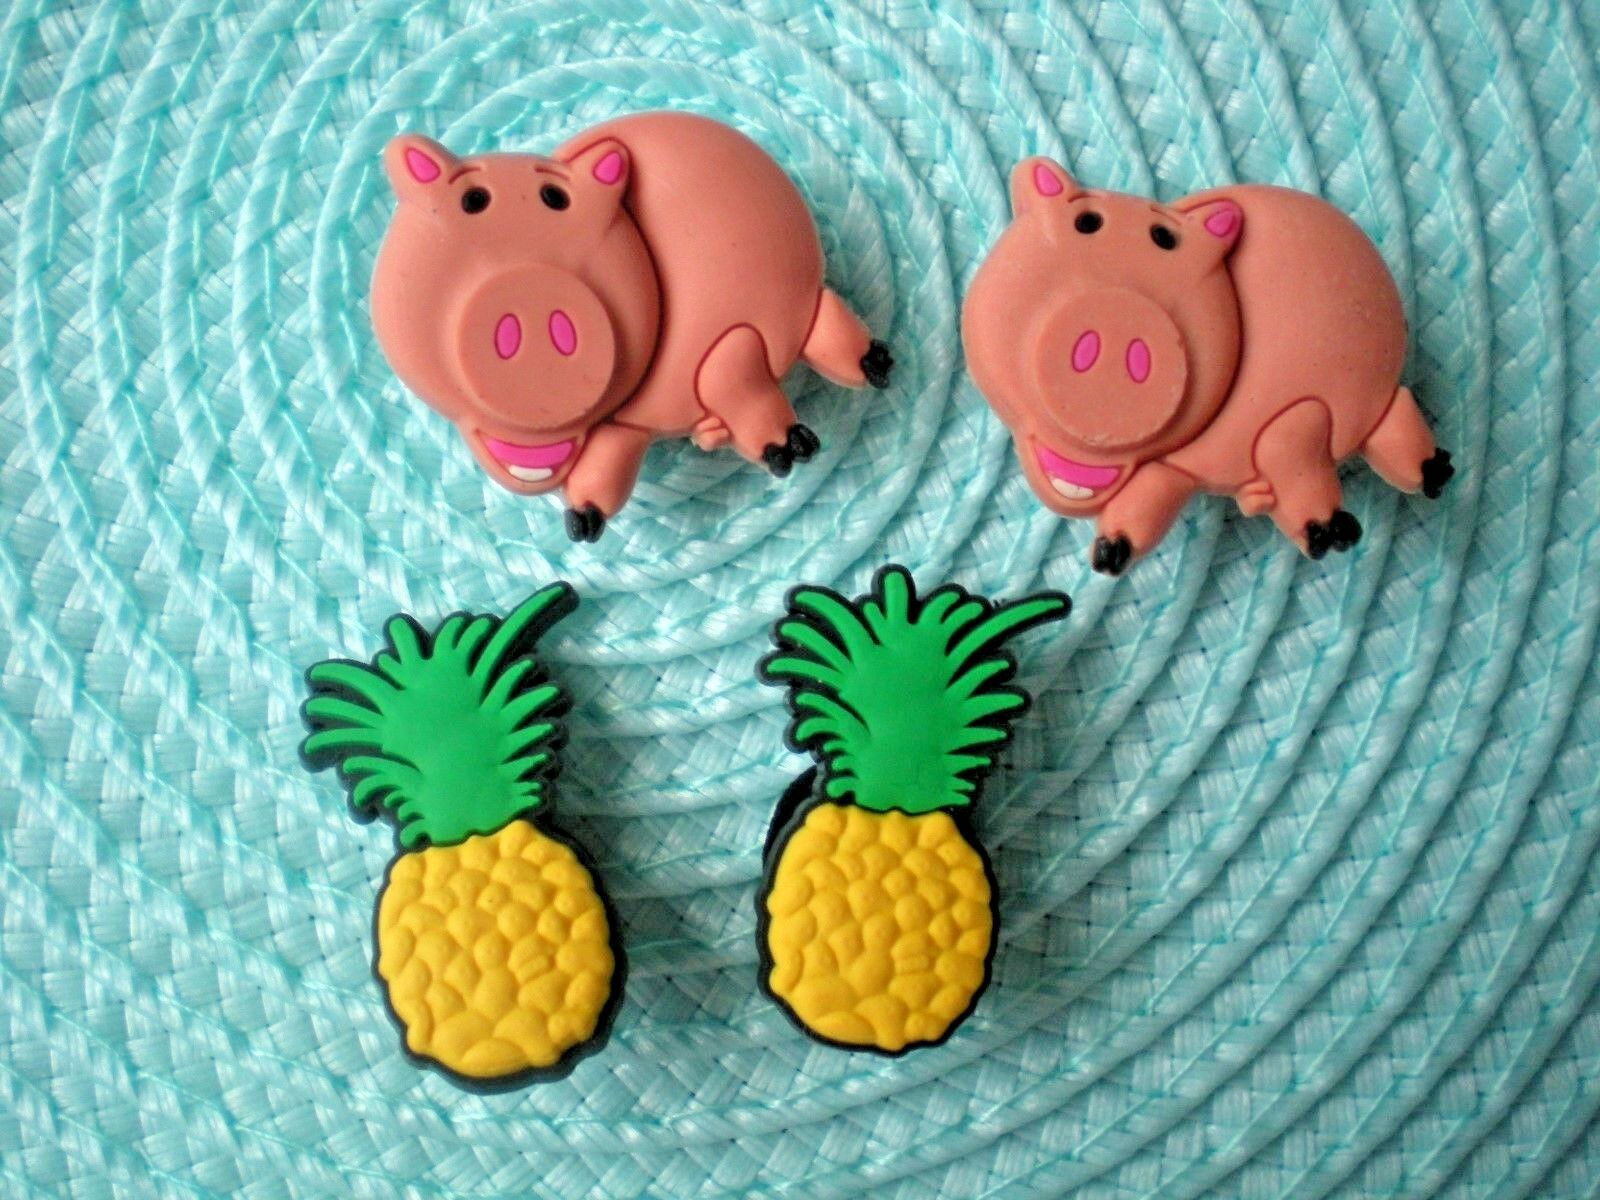 s Clog Shoe Charm Button Plug Accessorie WristBand Pig Pineapple